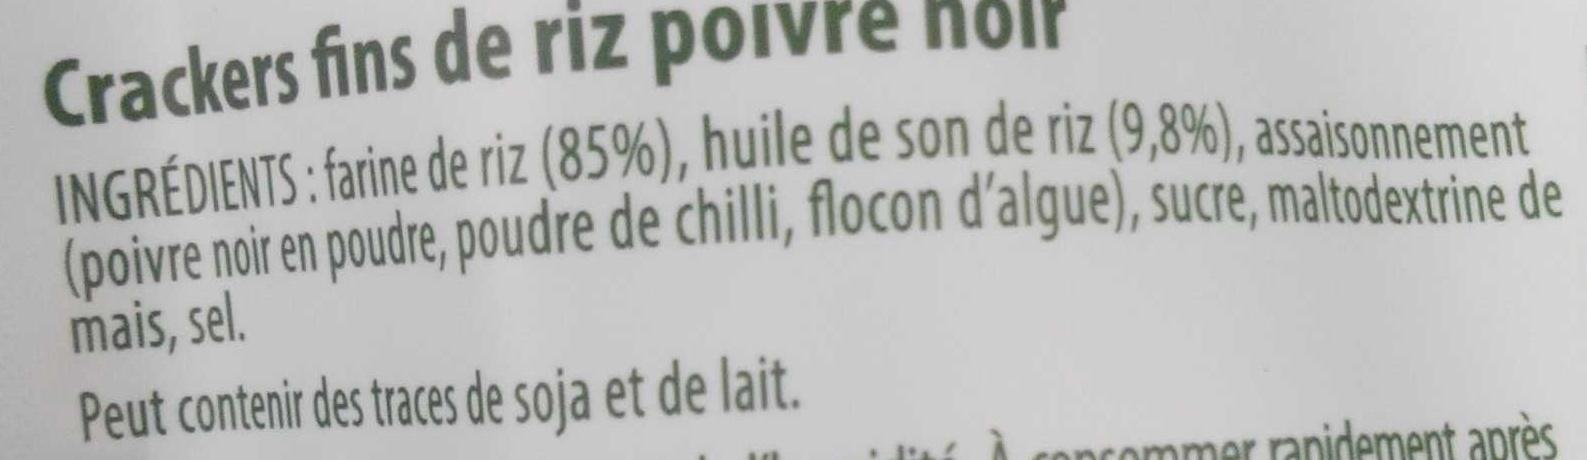 Rice Crackers - Poivre Noir - Ingredienti - fr